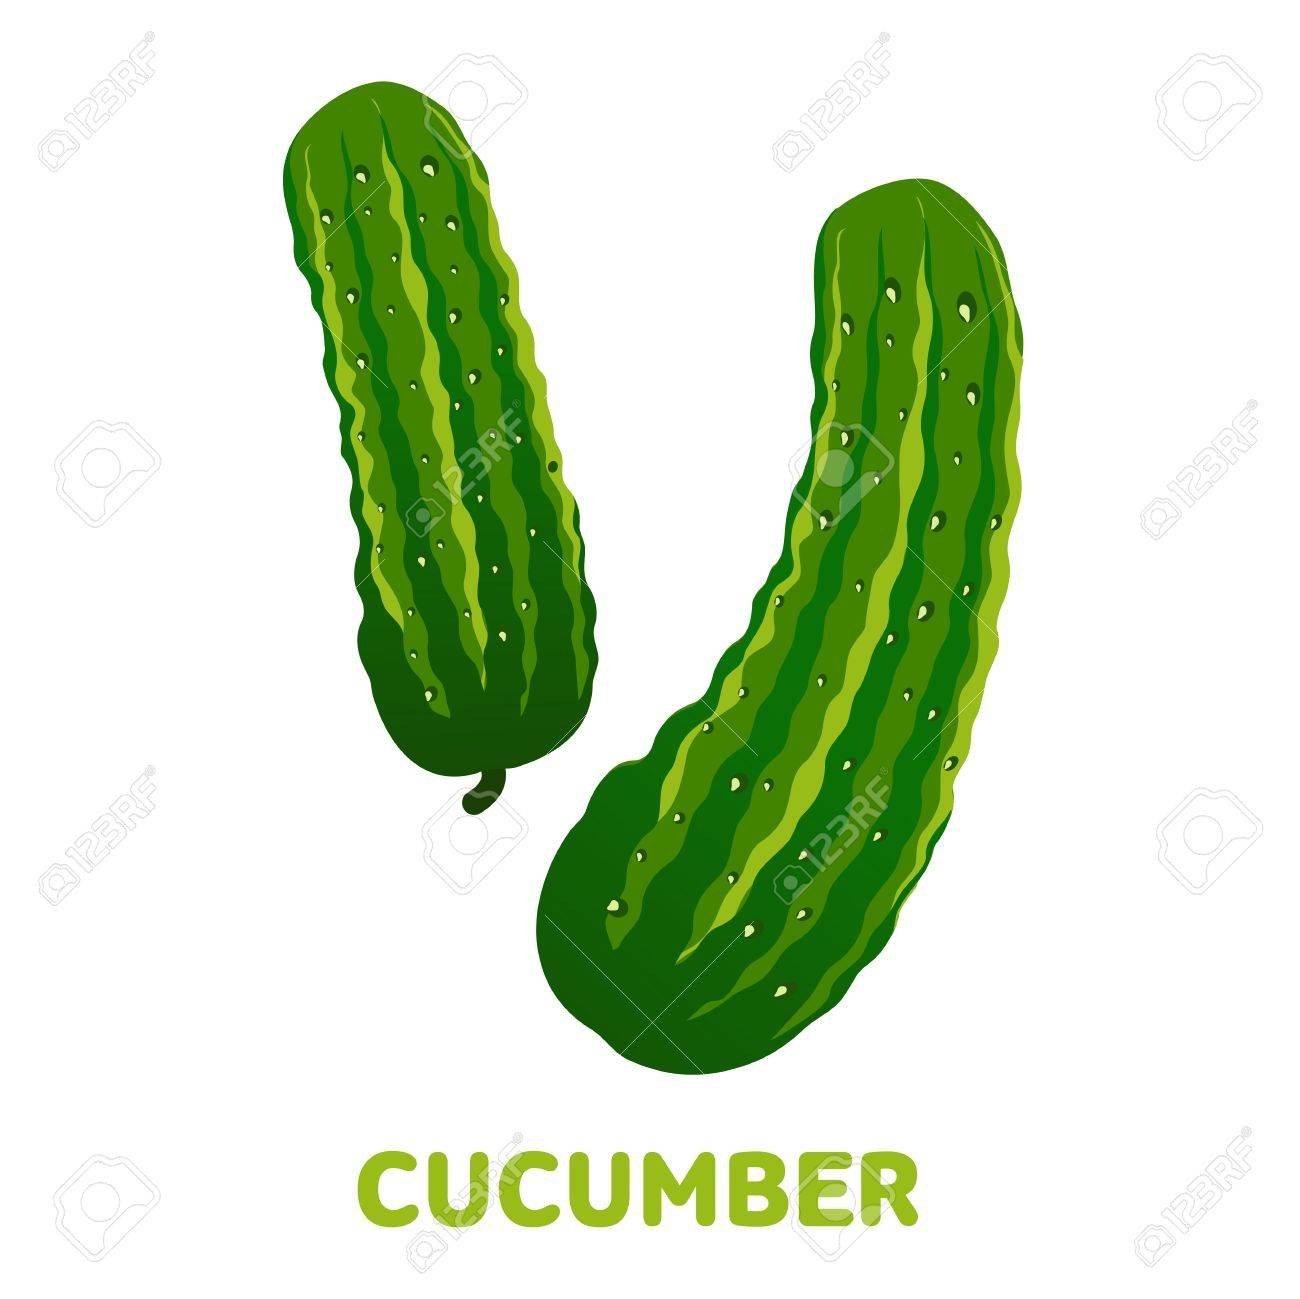 Fresh cucumber flat illustration. Cucumber for farm market, vegetarian salad recipe design. Cucumber badges, labels. Vector illustration isolated on white background - 81897026